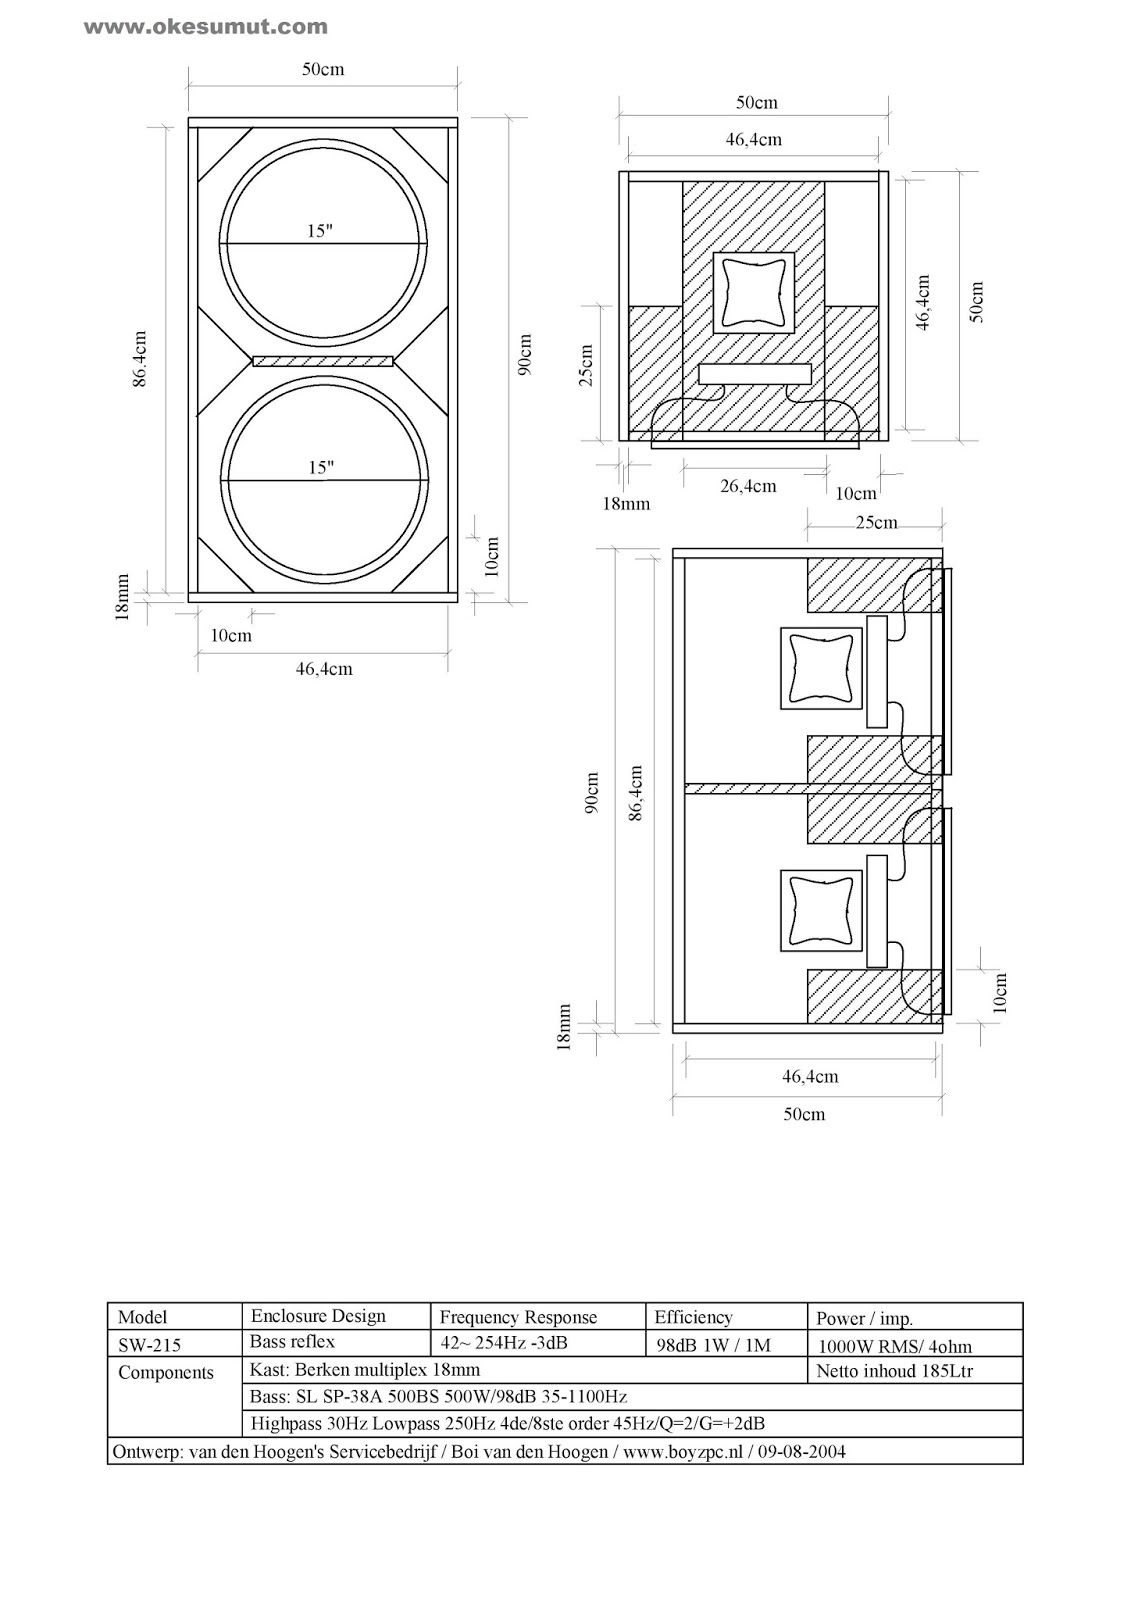 hight resolution of box speaker 15x2 bass selamat datang sebelumnya di oeksumut disini diagram chart box speaker